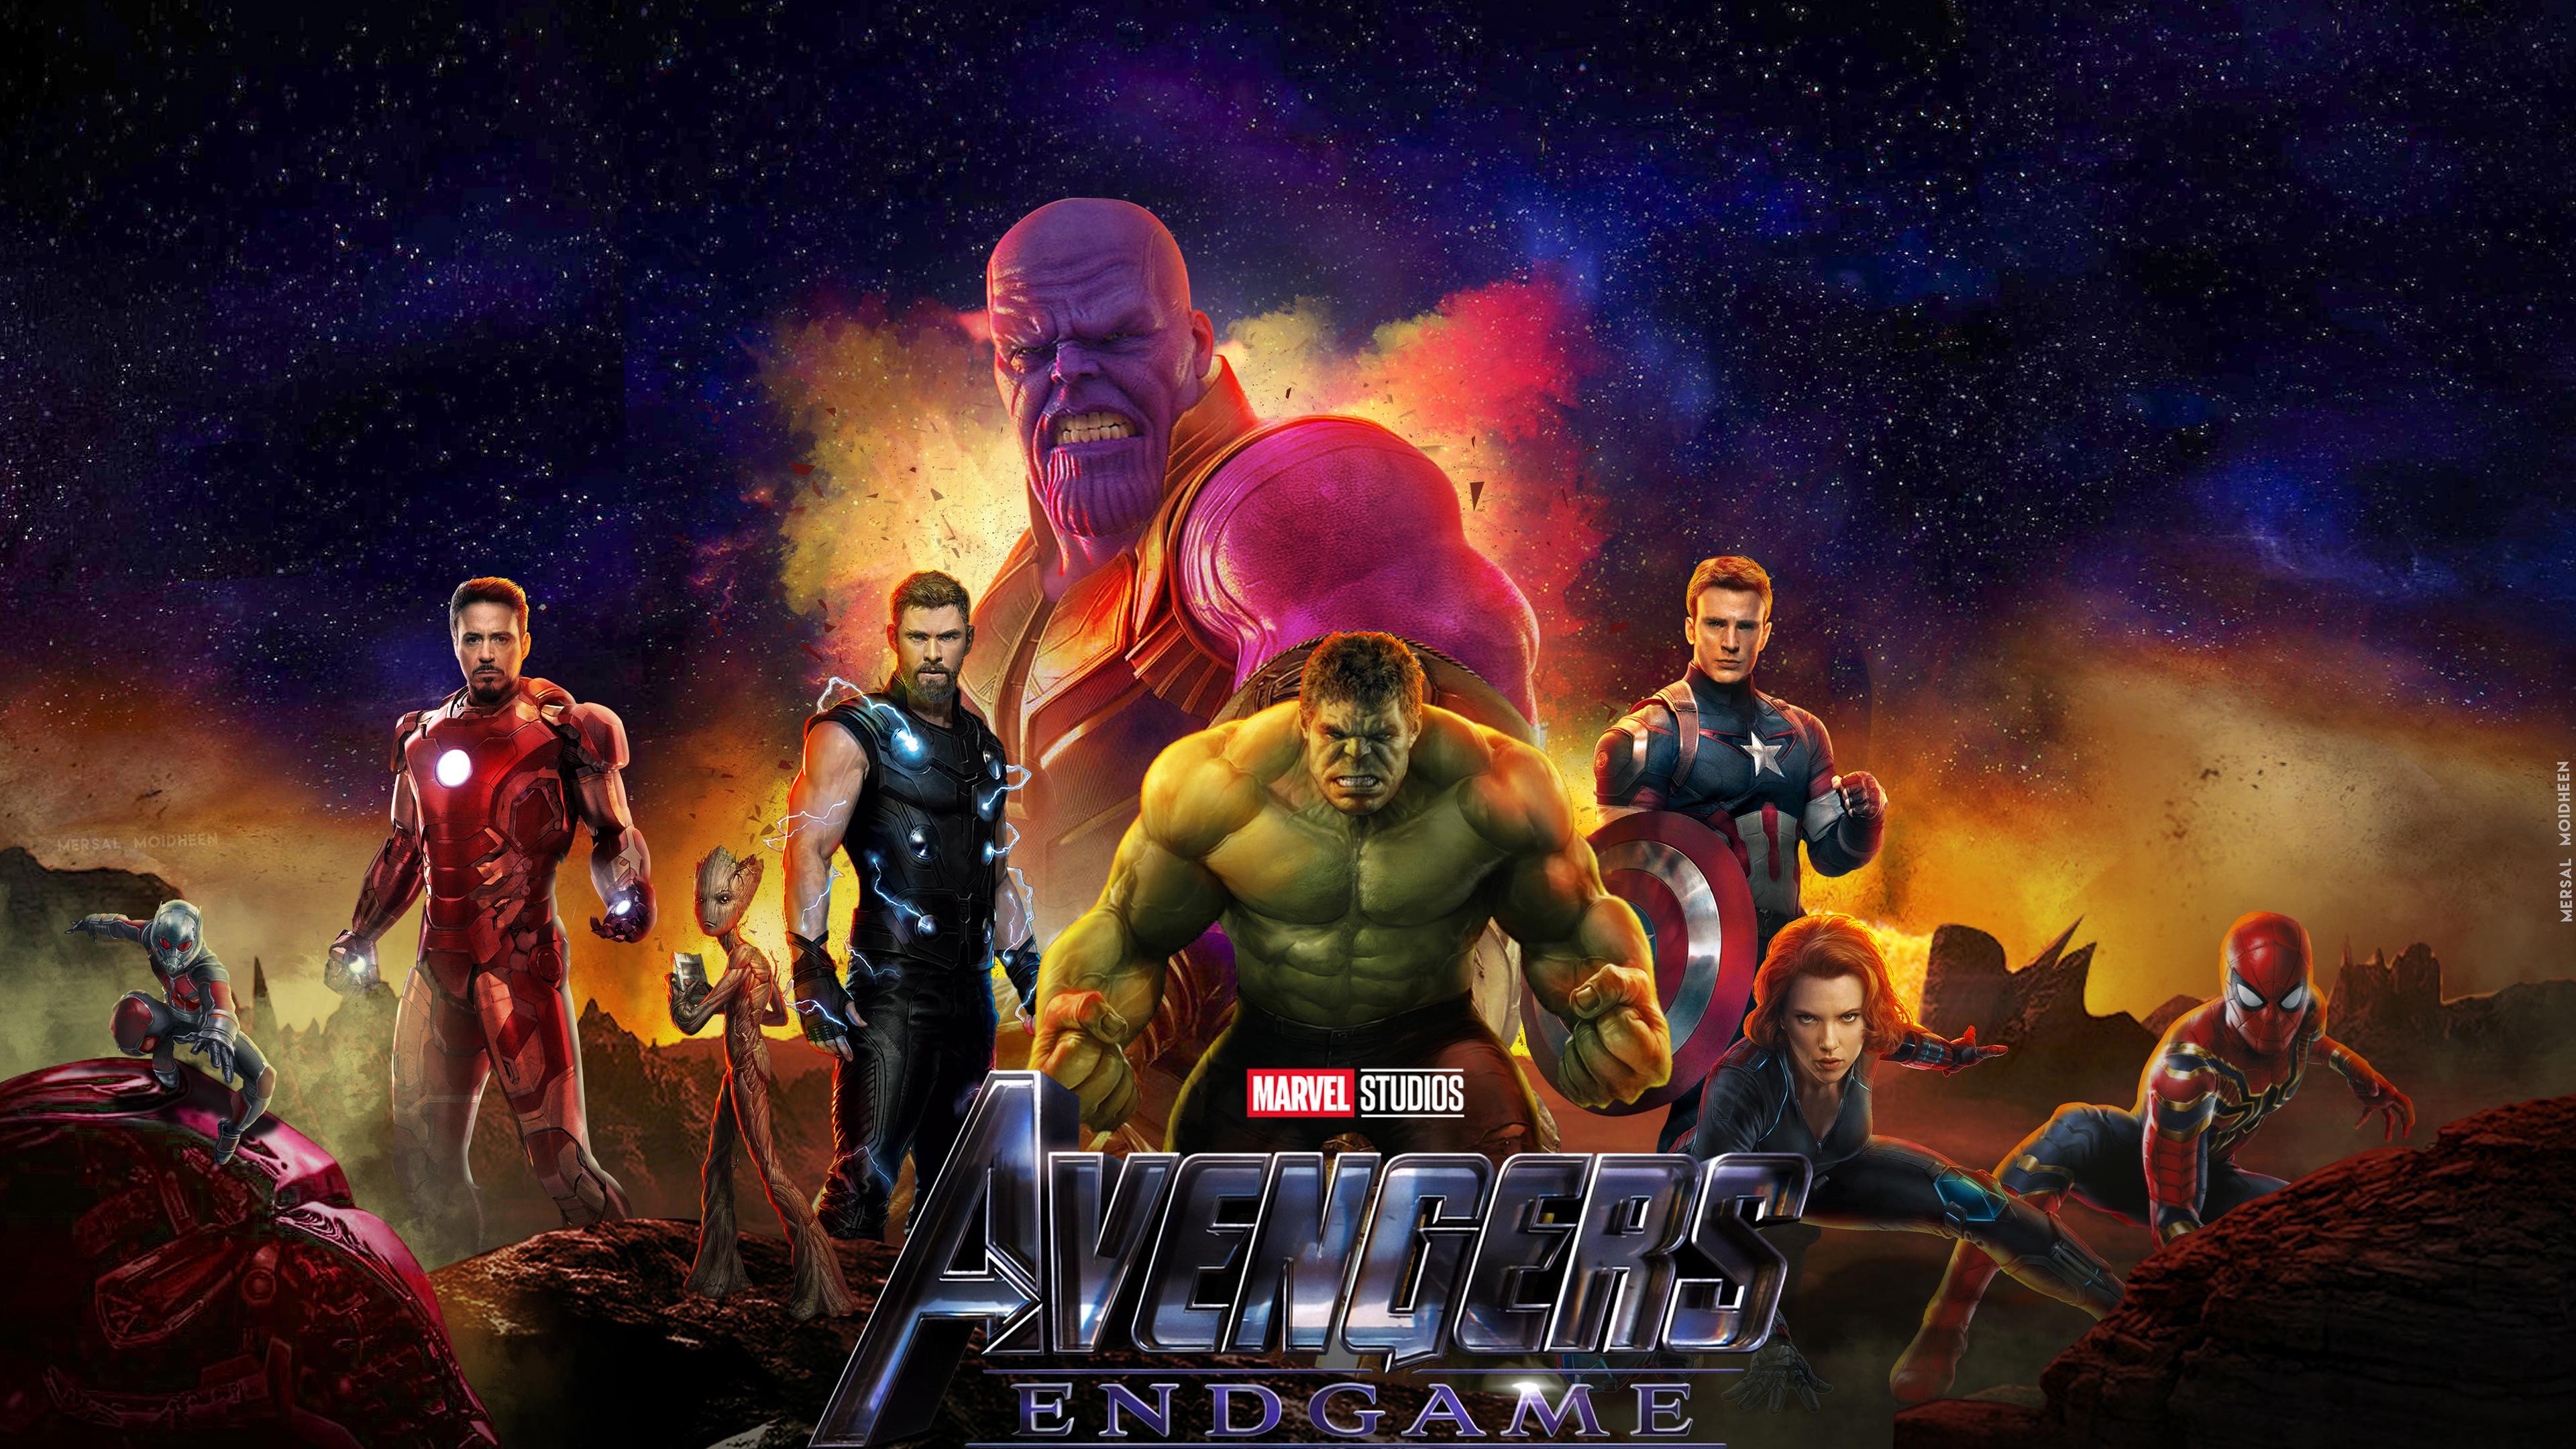 Wallpaper 4k 2019 Avengers Endgame New 4k 2019 Movies Wallpapers 4k Wallpapers Avengers Endgame Wallpapers Behance Wallpapers Hd Wallpapers Movies Wallpapers Superheroes Wallpapers